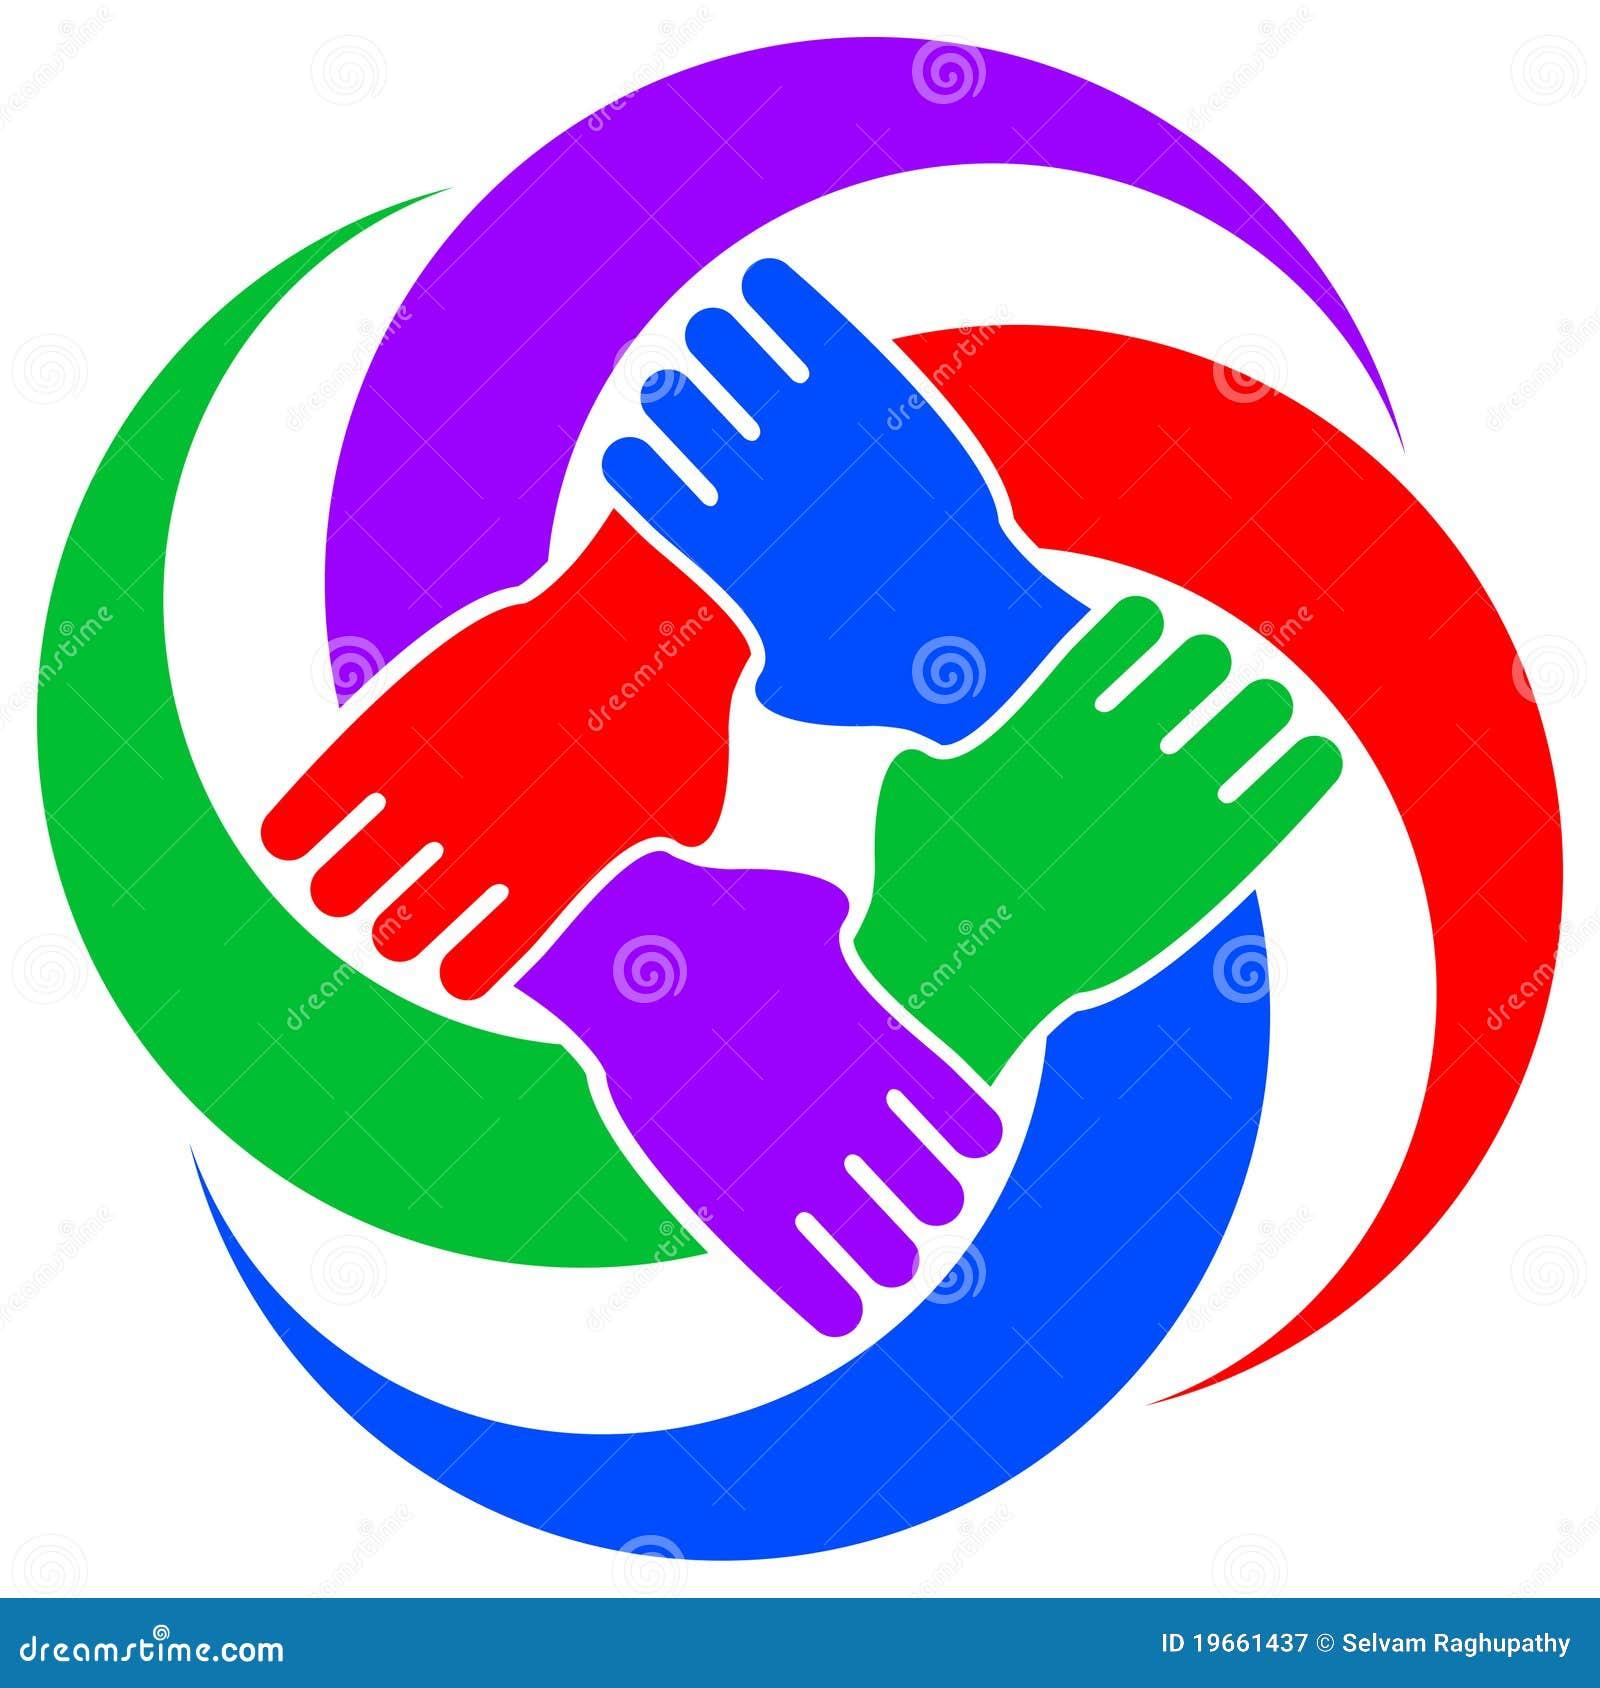 Cooperation Symbol Royalty Free Stock Photography Image